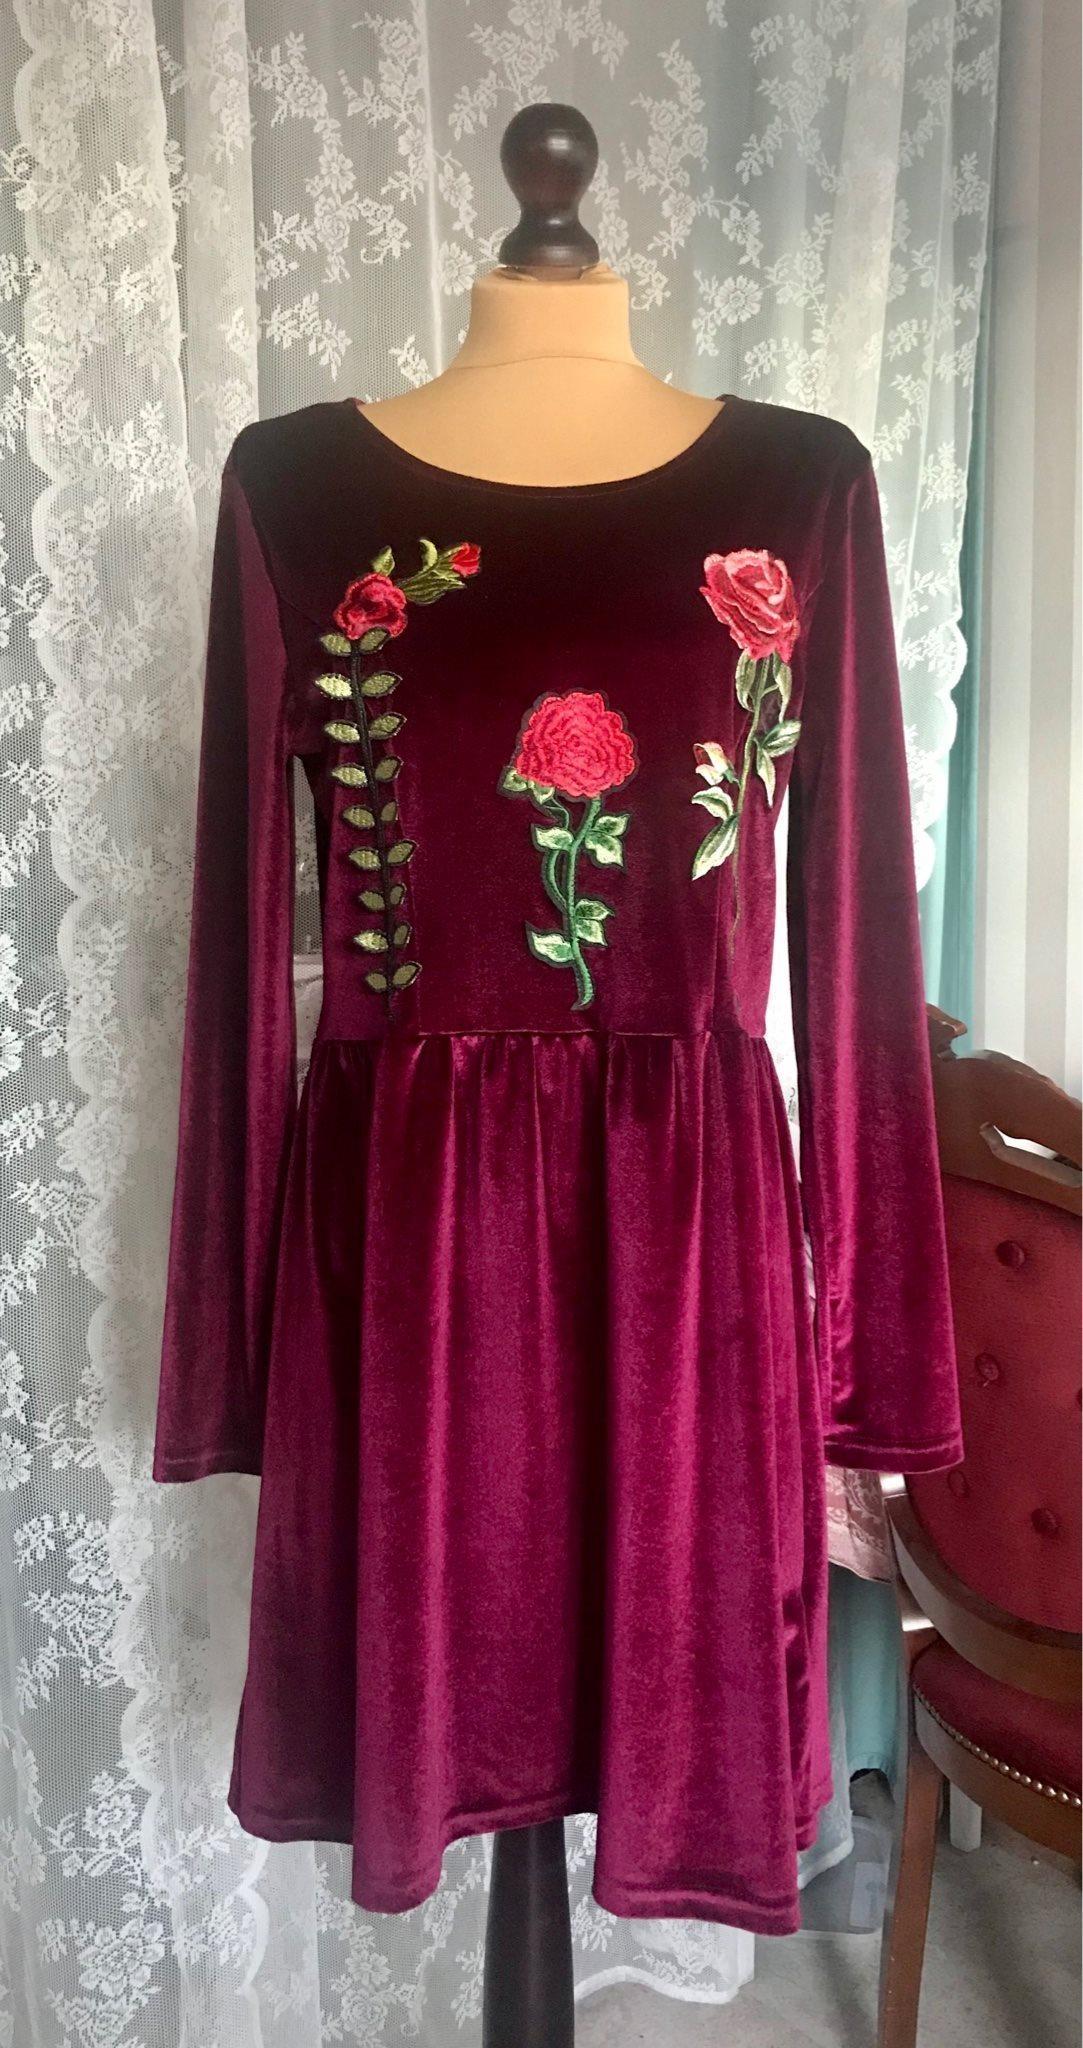 Vinröd klänning sammet